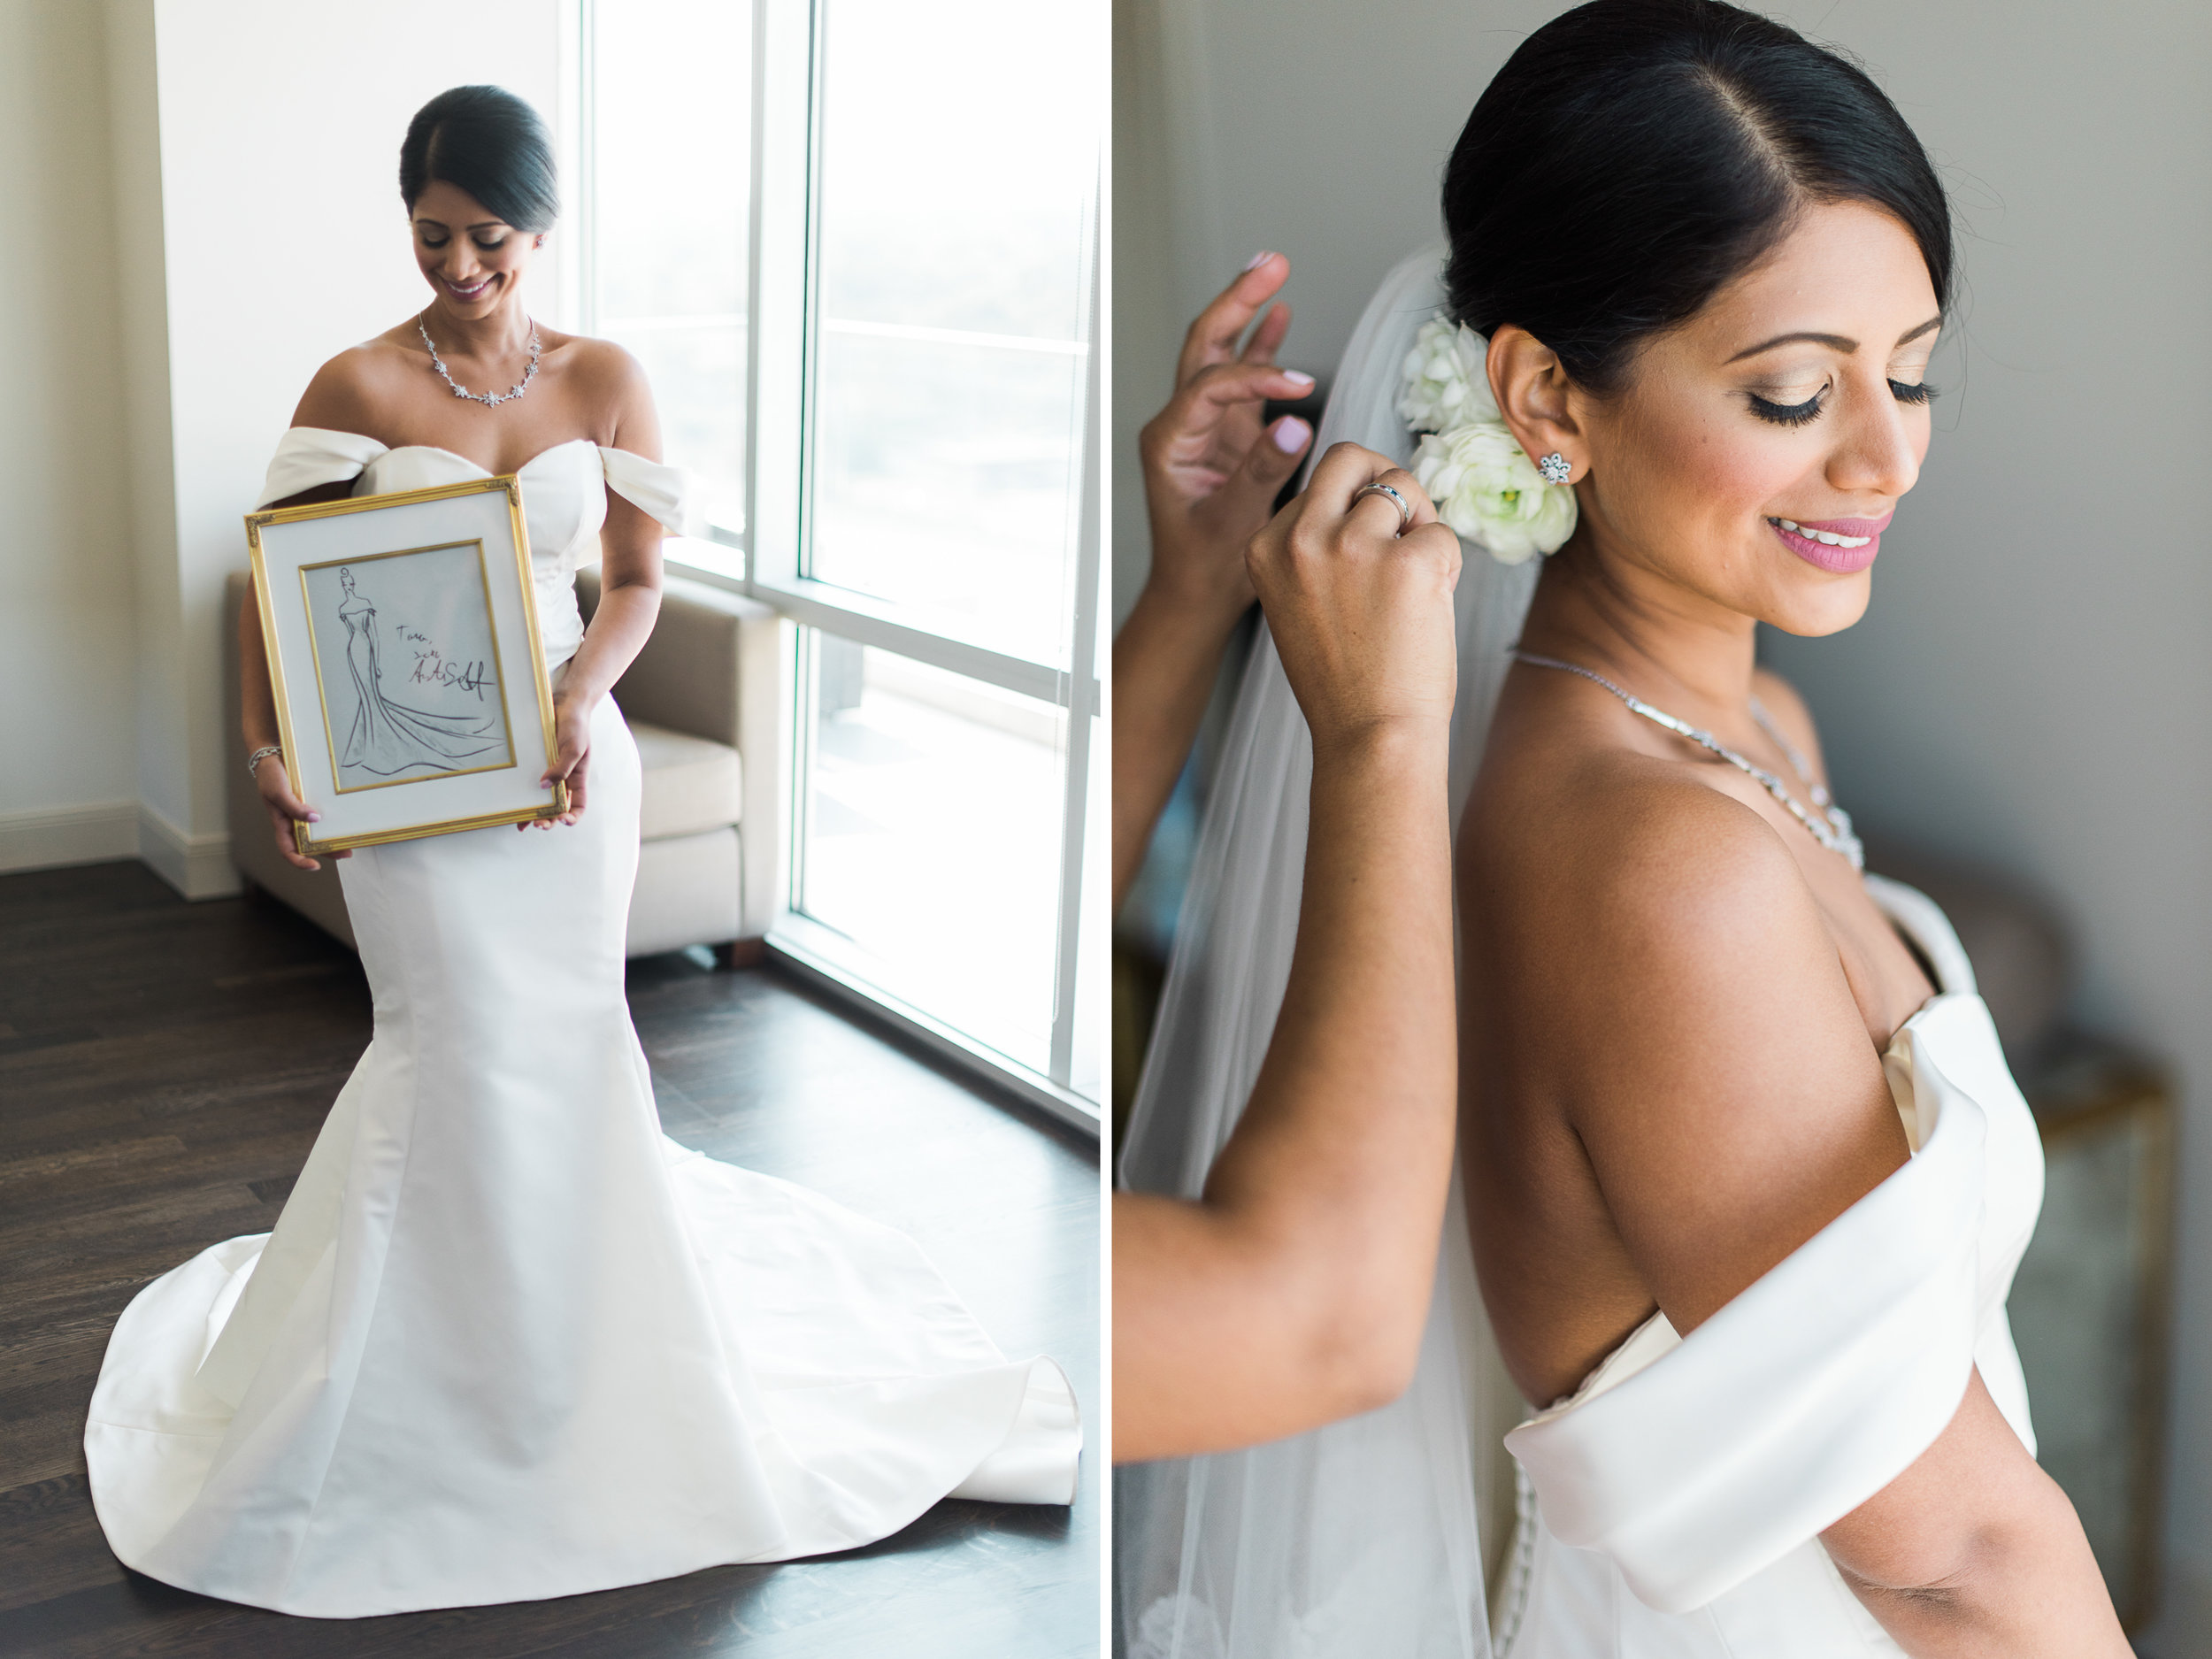 Fine-Art-Film-Houston-Wedding-Photographer-Best-Top-Luxury-Texas-Austin-Dallas-Destination-Dana-Fernandez-Photography-The-Bell-Tower-on-34th-Indian-102.jpg